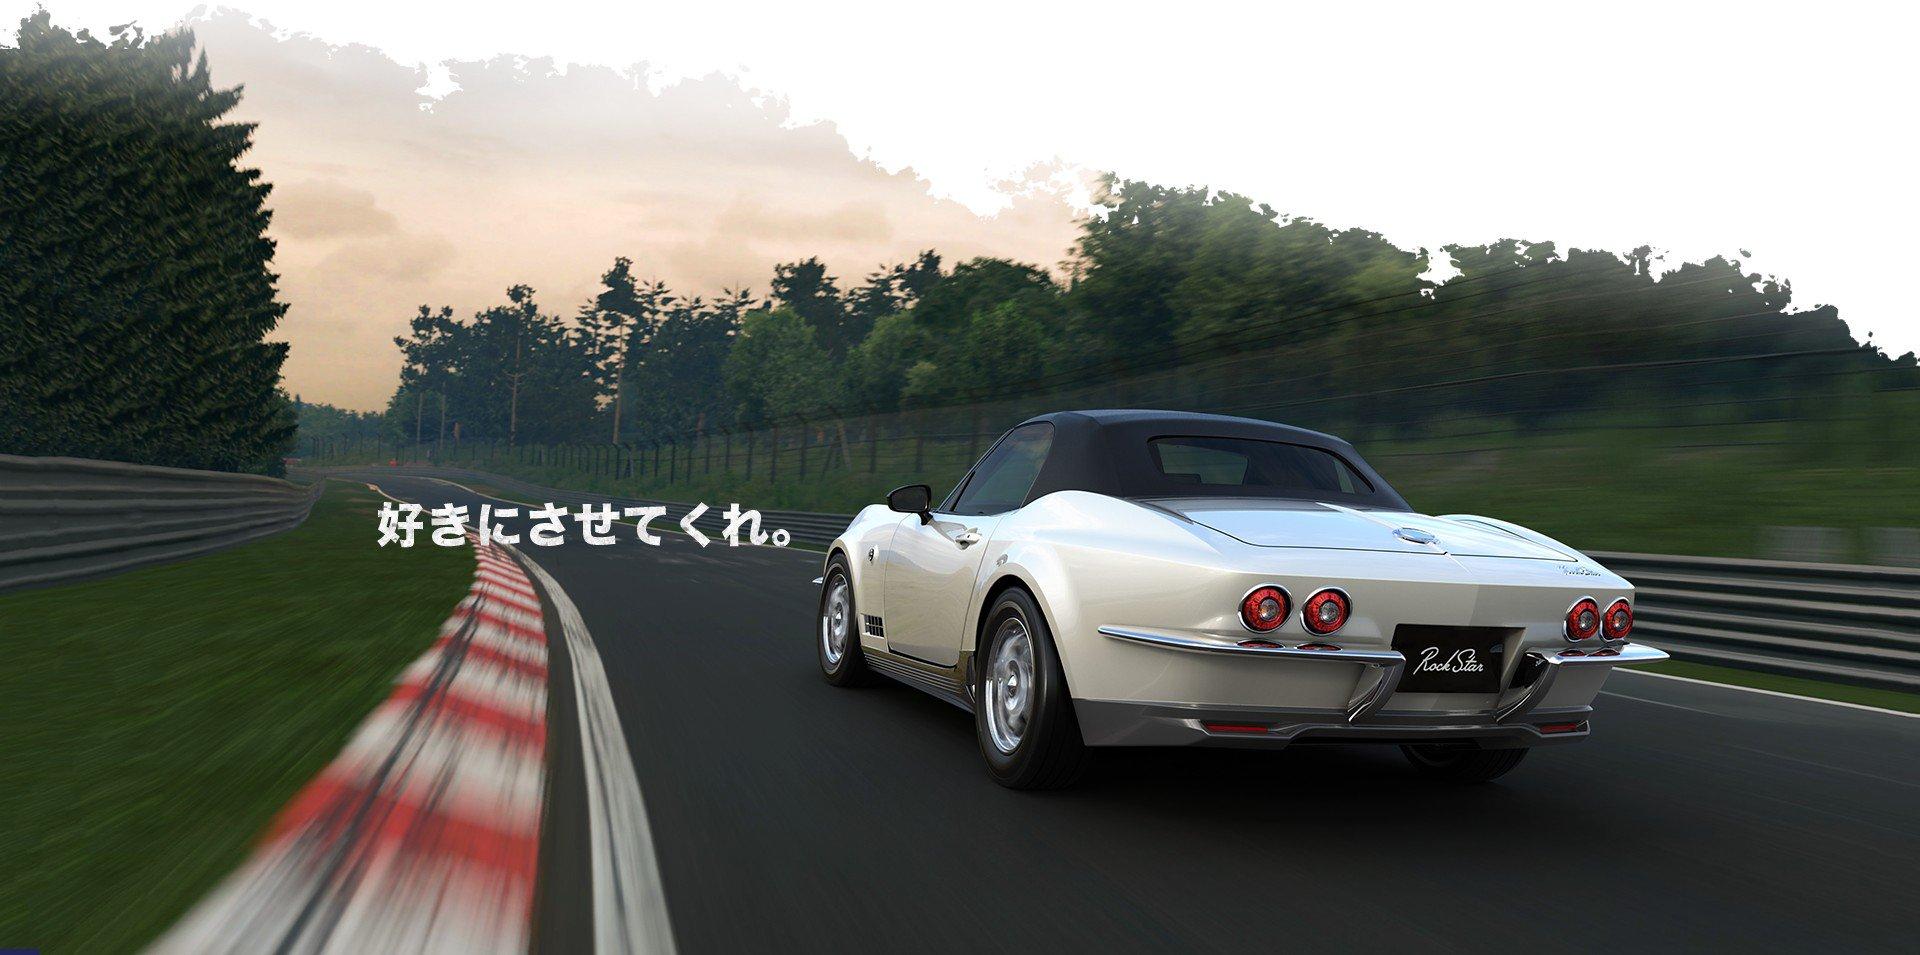 60916244-mitsuoka-rock-star-8